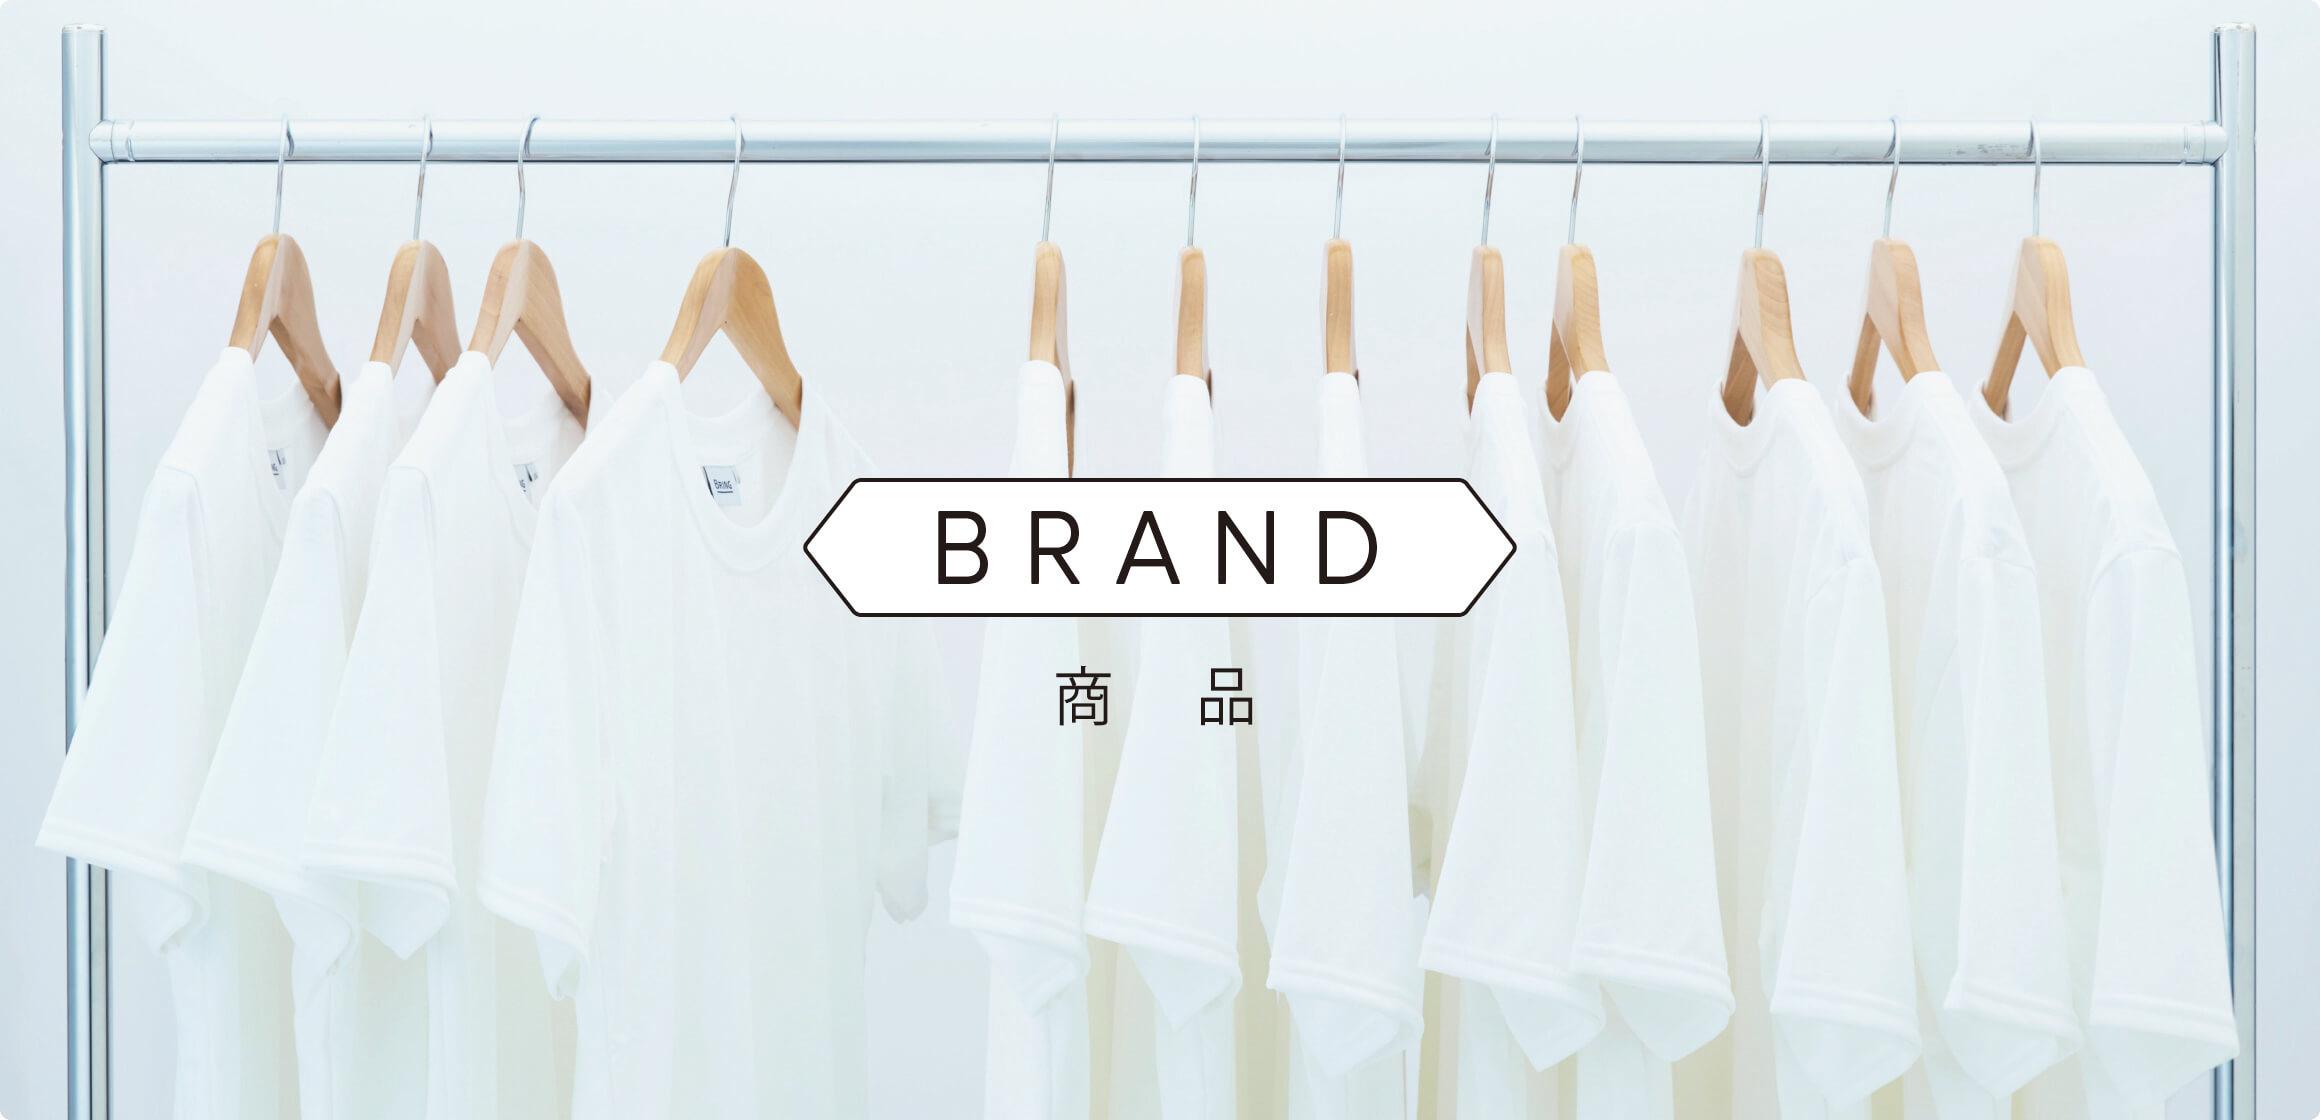 BRAND 商品